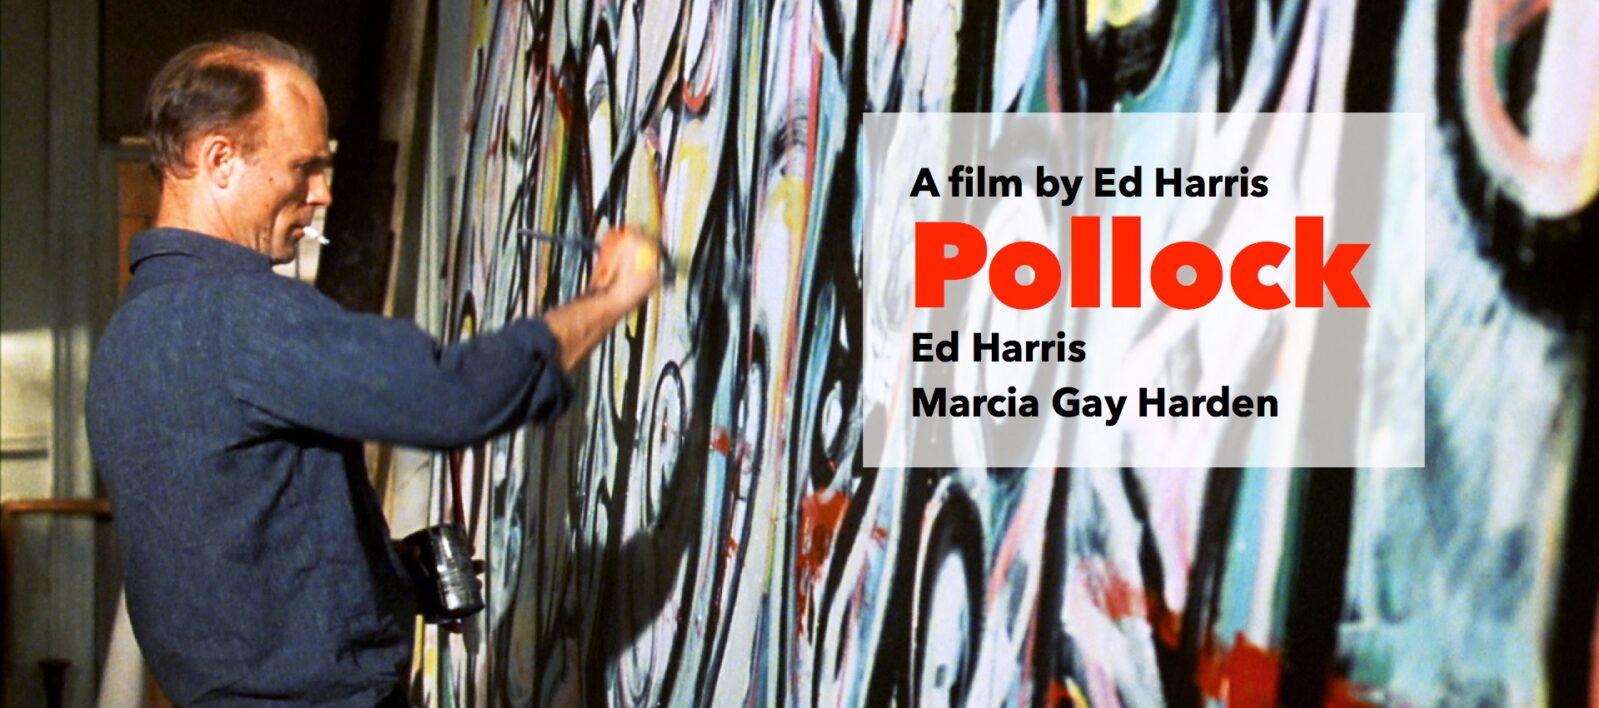 Pollock, a film by Ed Harris